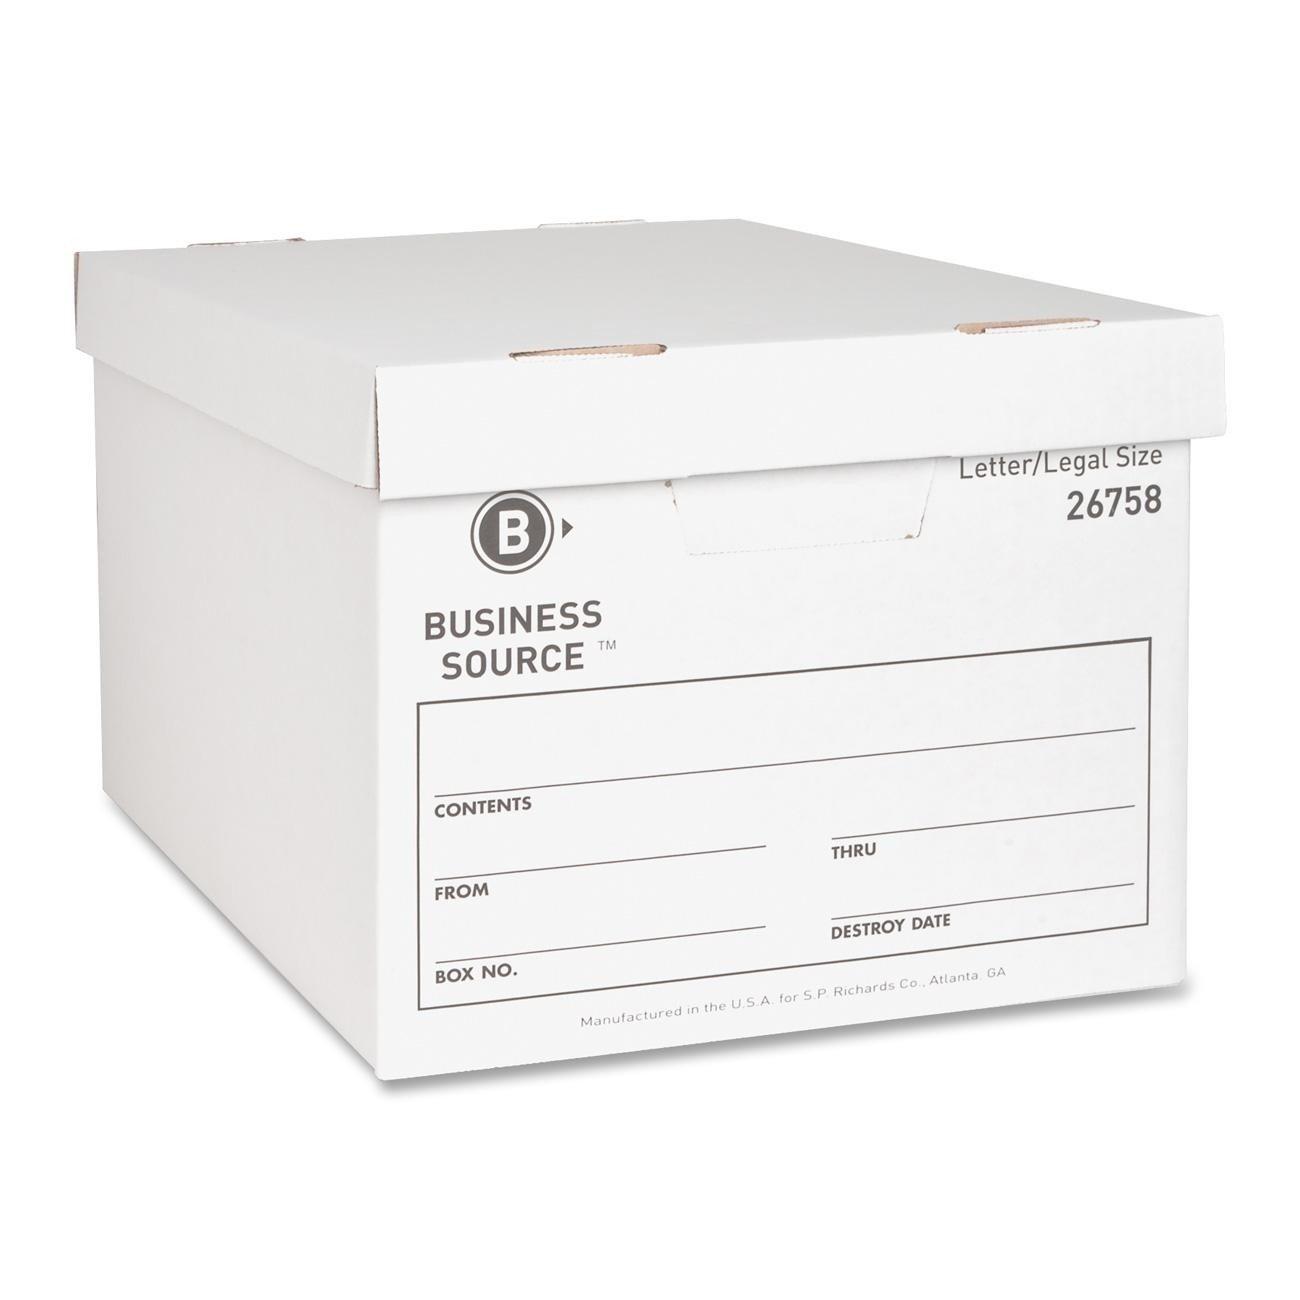 Business Source Lift-off Lid Medium Duty Storage Box - 12 Pack